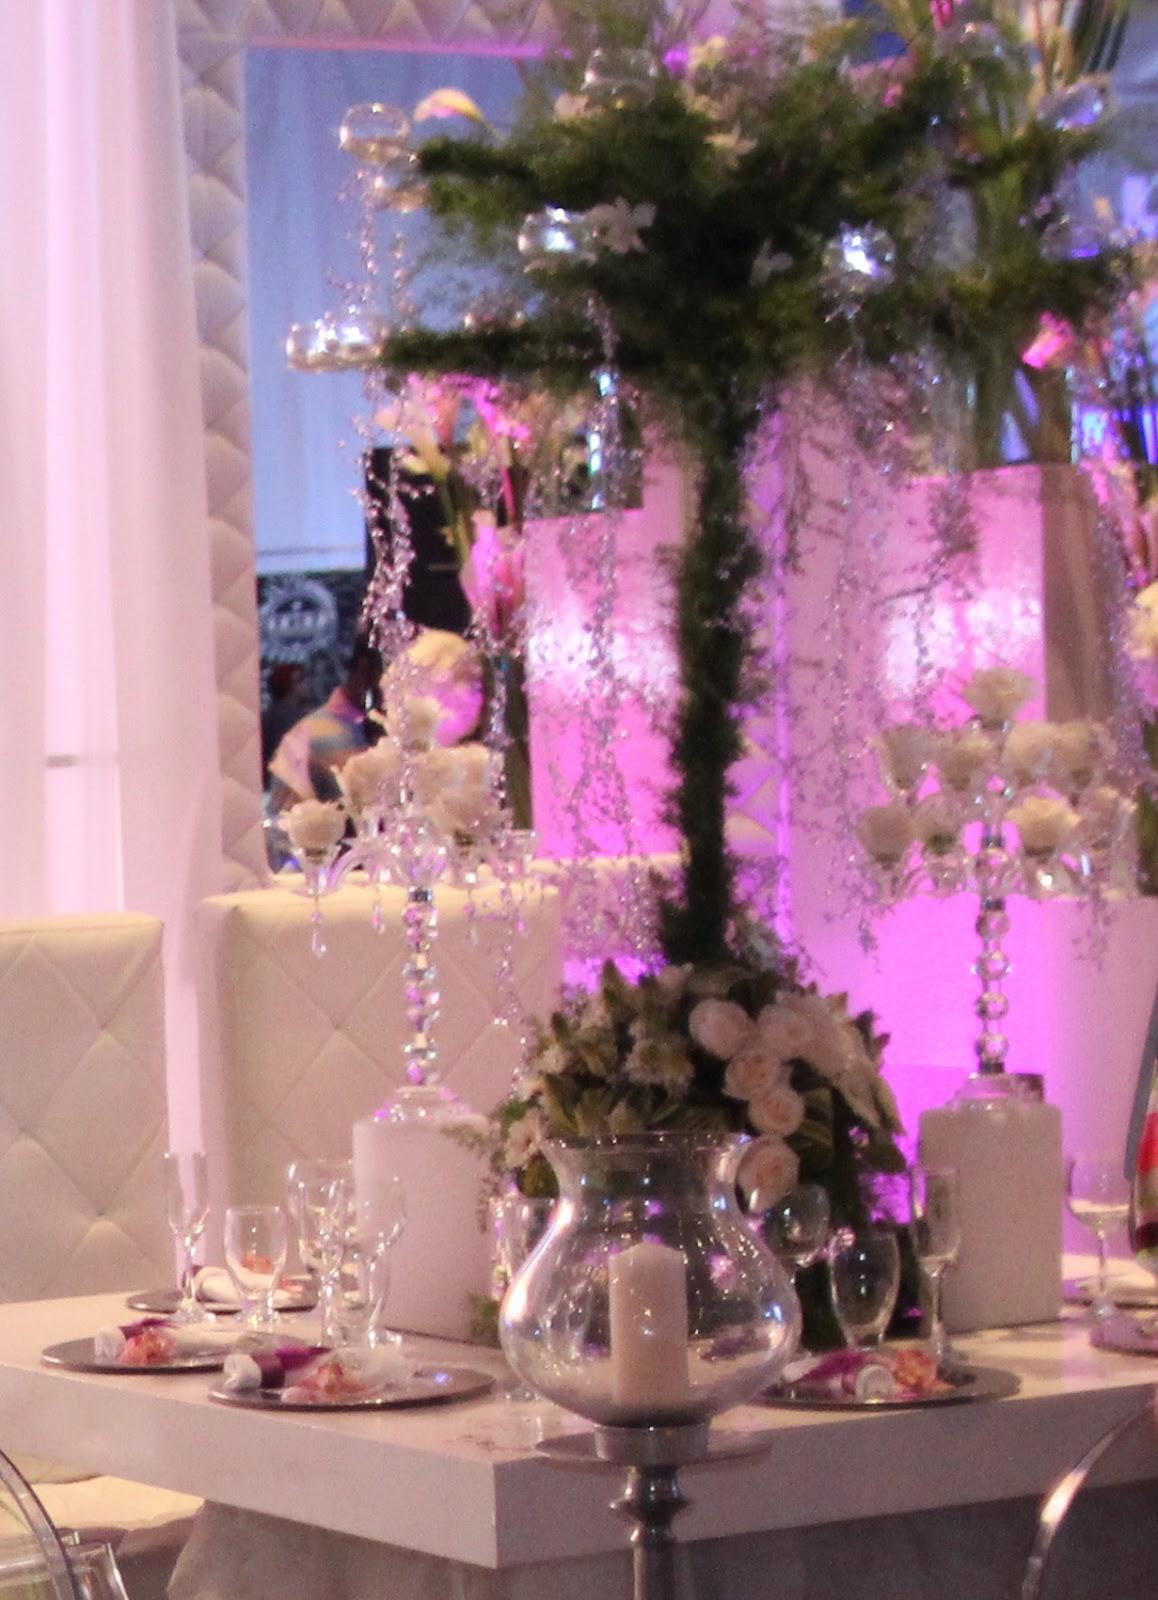 Fiestas de bodas elegantes for Fiestas elegantes decoracion